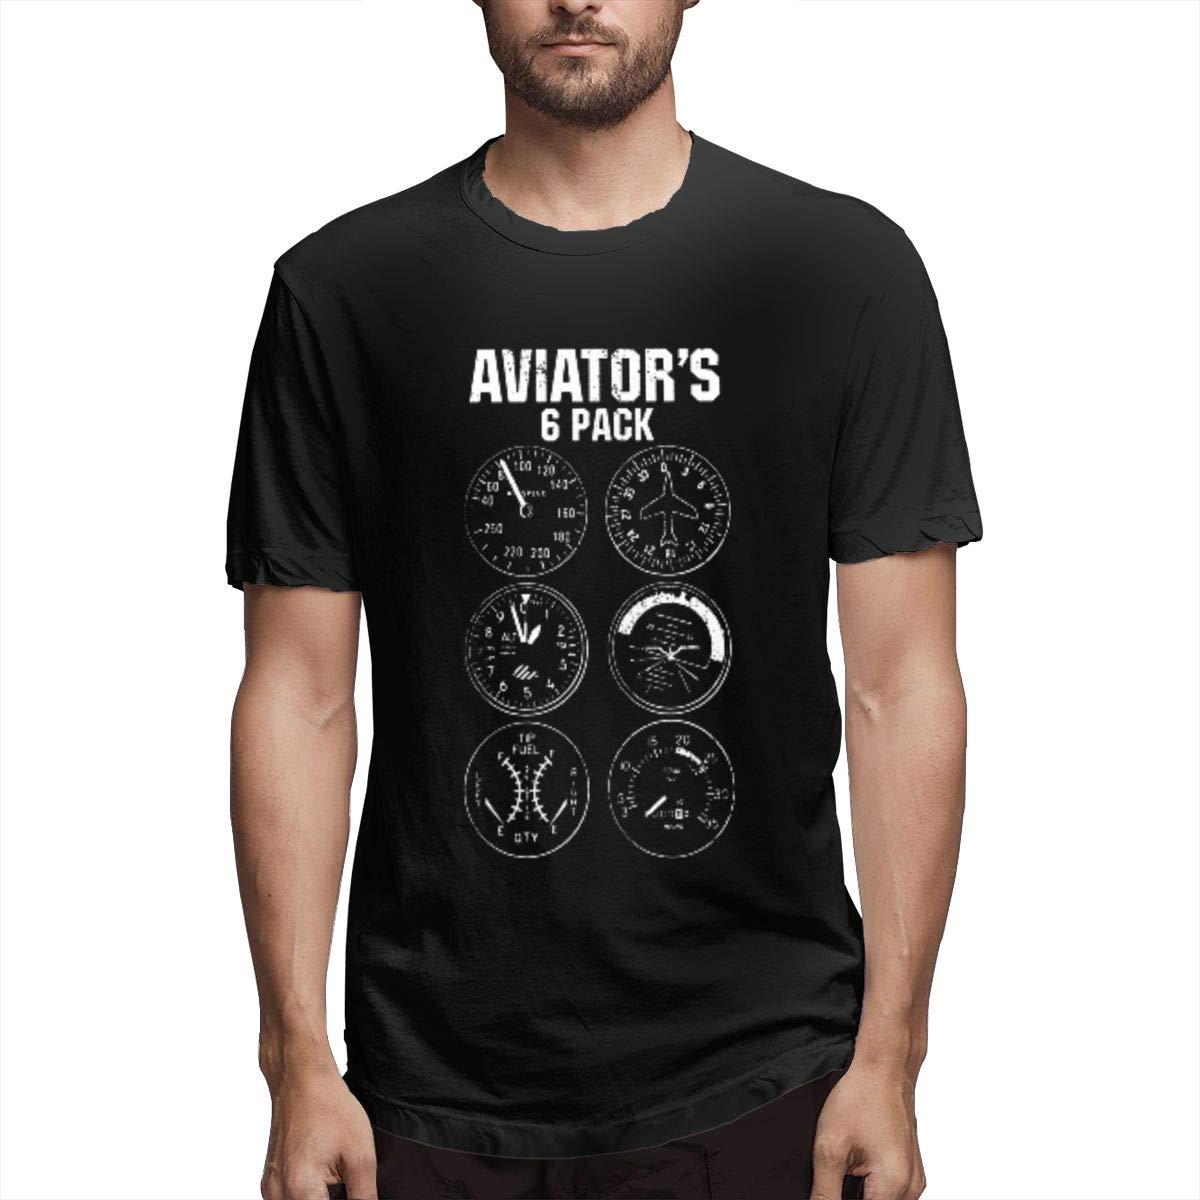 Xuforget Men Aviator Six Pack School Short Sleeve Tee Shirt Cotton Tops